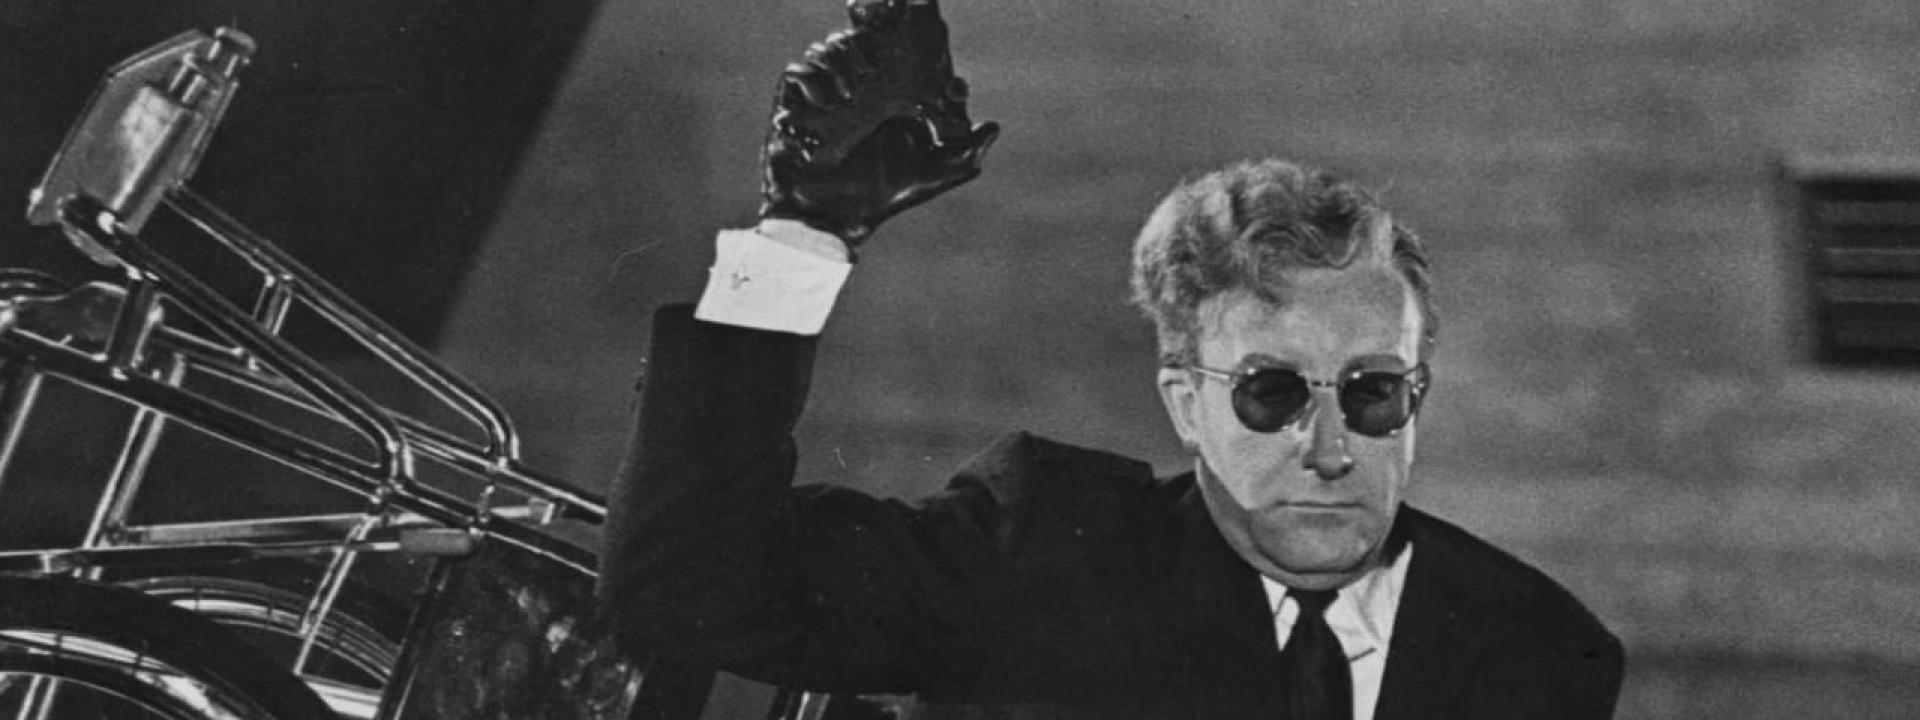 Park Your Cinema: Dr. Strangelove (1964) - Εικόνα